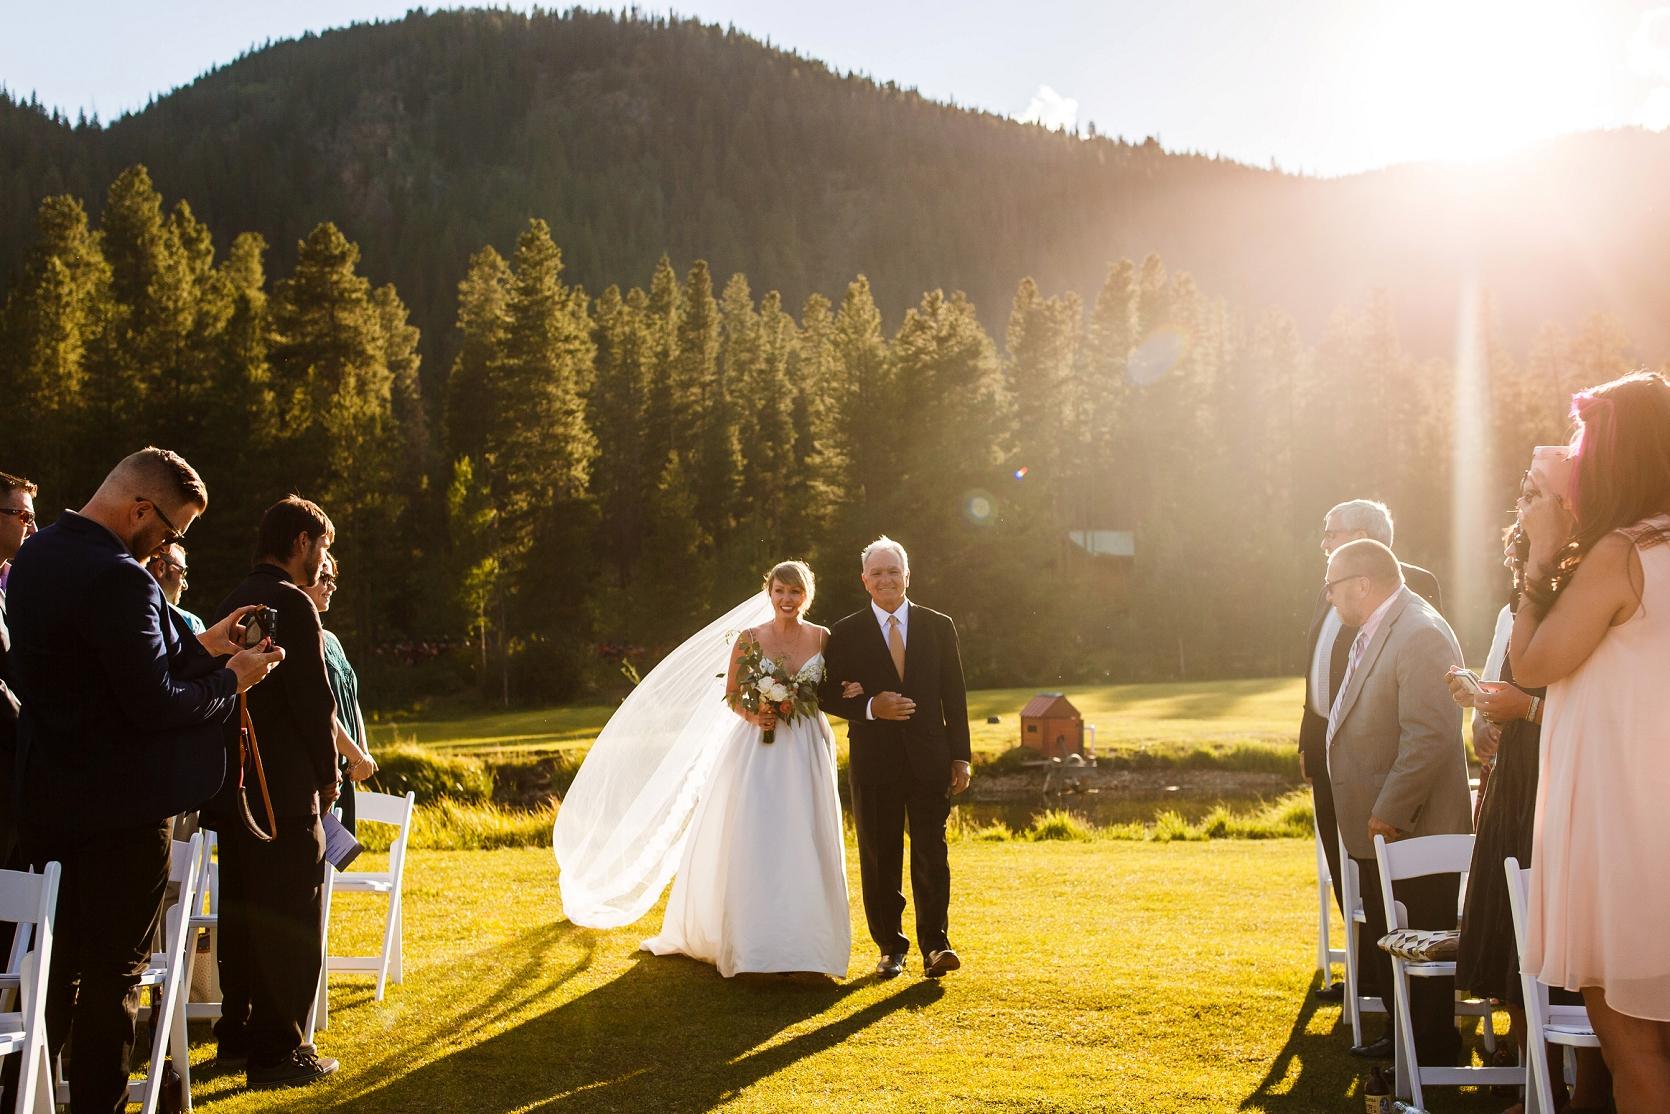 Mark Amp Kates Beautiful Camp Hale Wedding In Vail Colorado